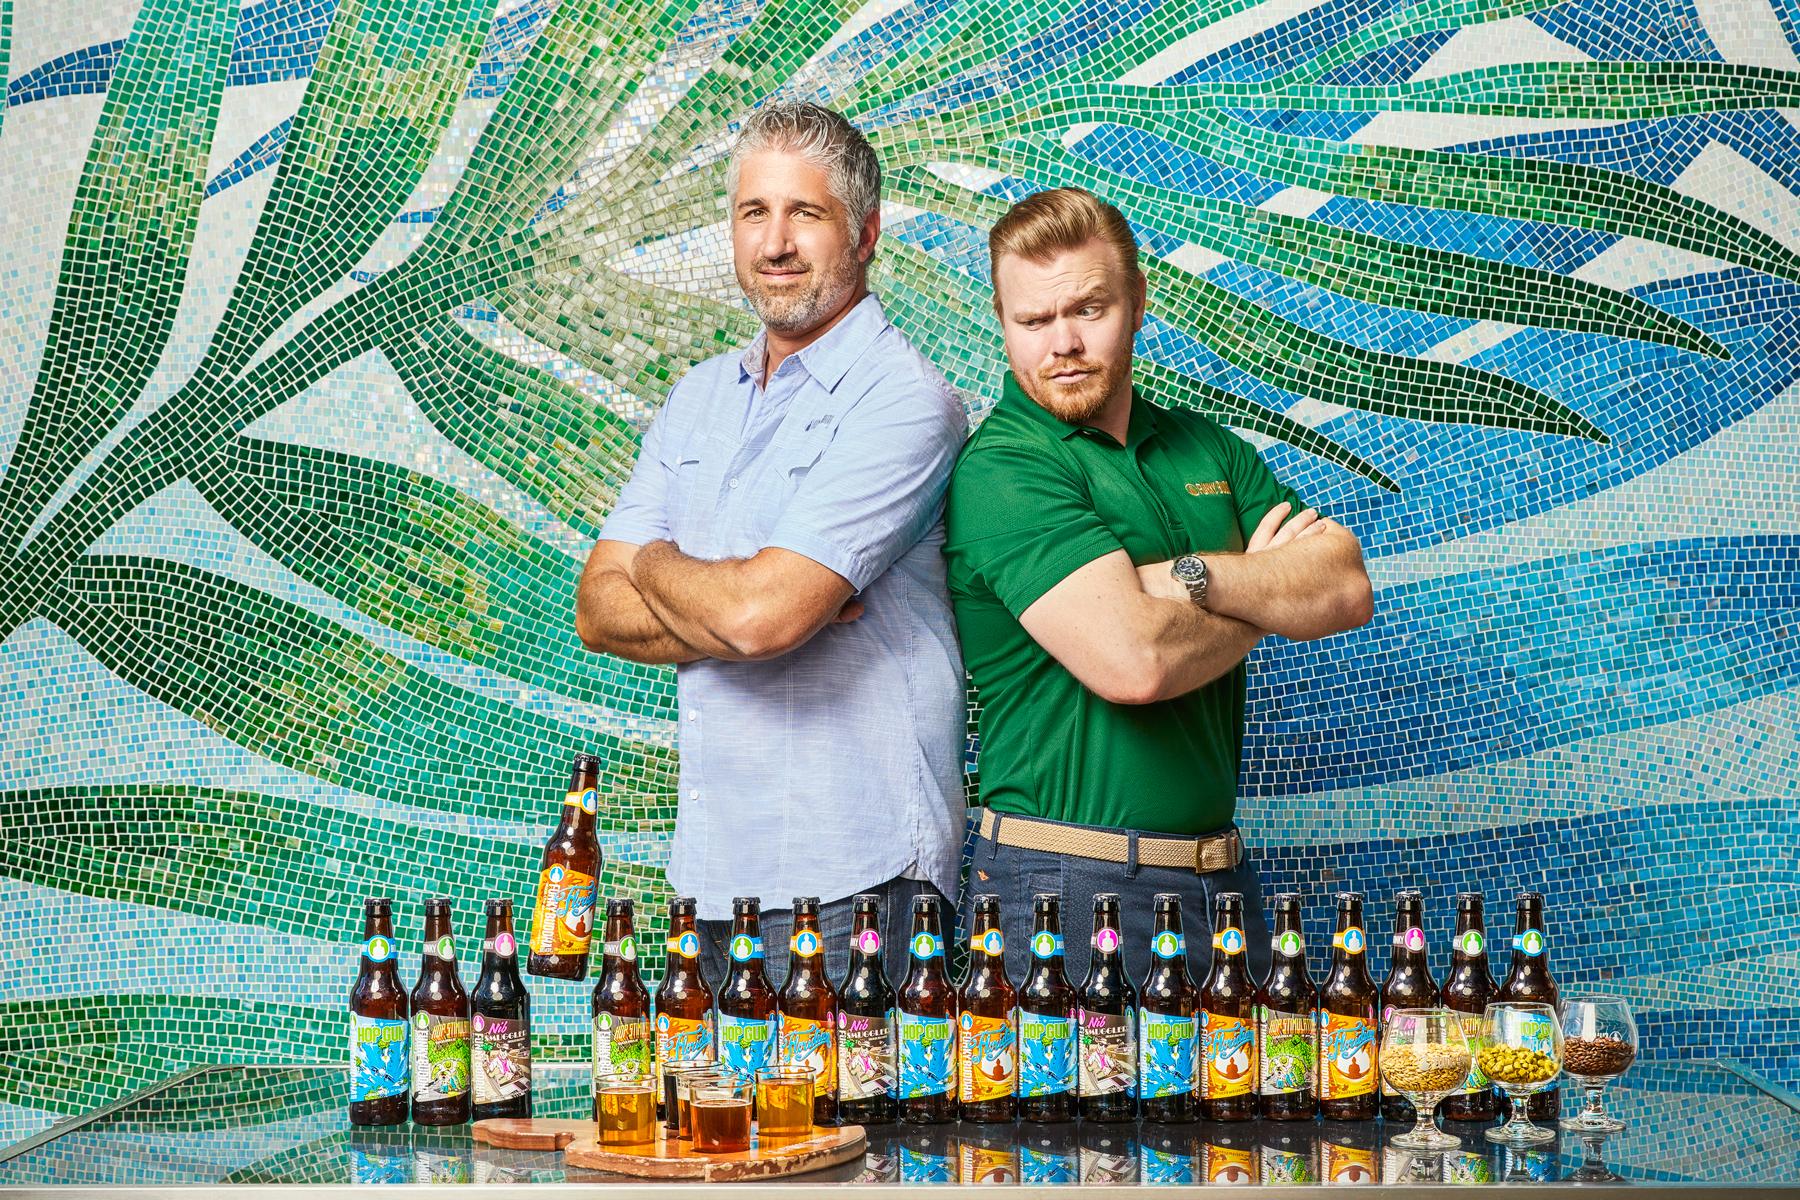 Loews Miami Beach + Funky Buddha Brewery